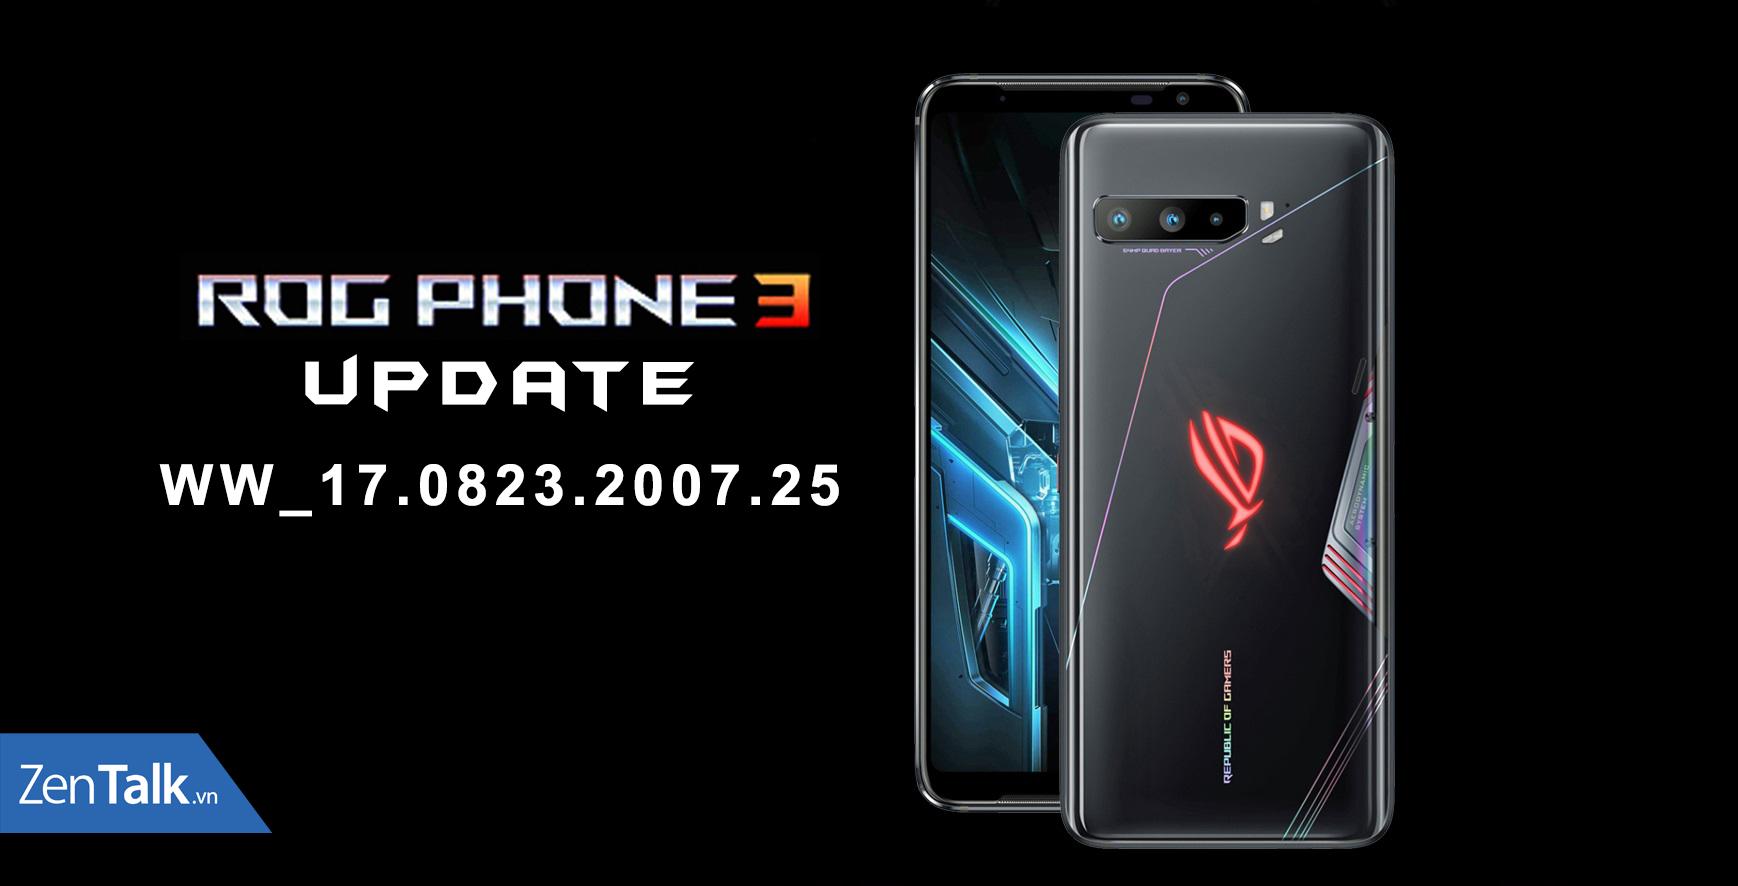 rog-phone-3-update-ww_17-0823-2007-25-jpg.11099